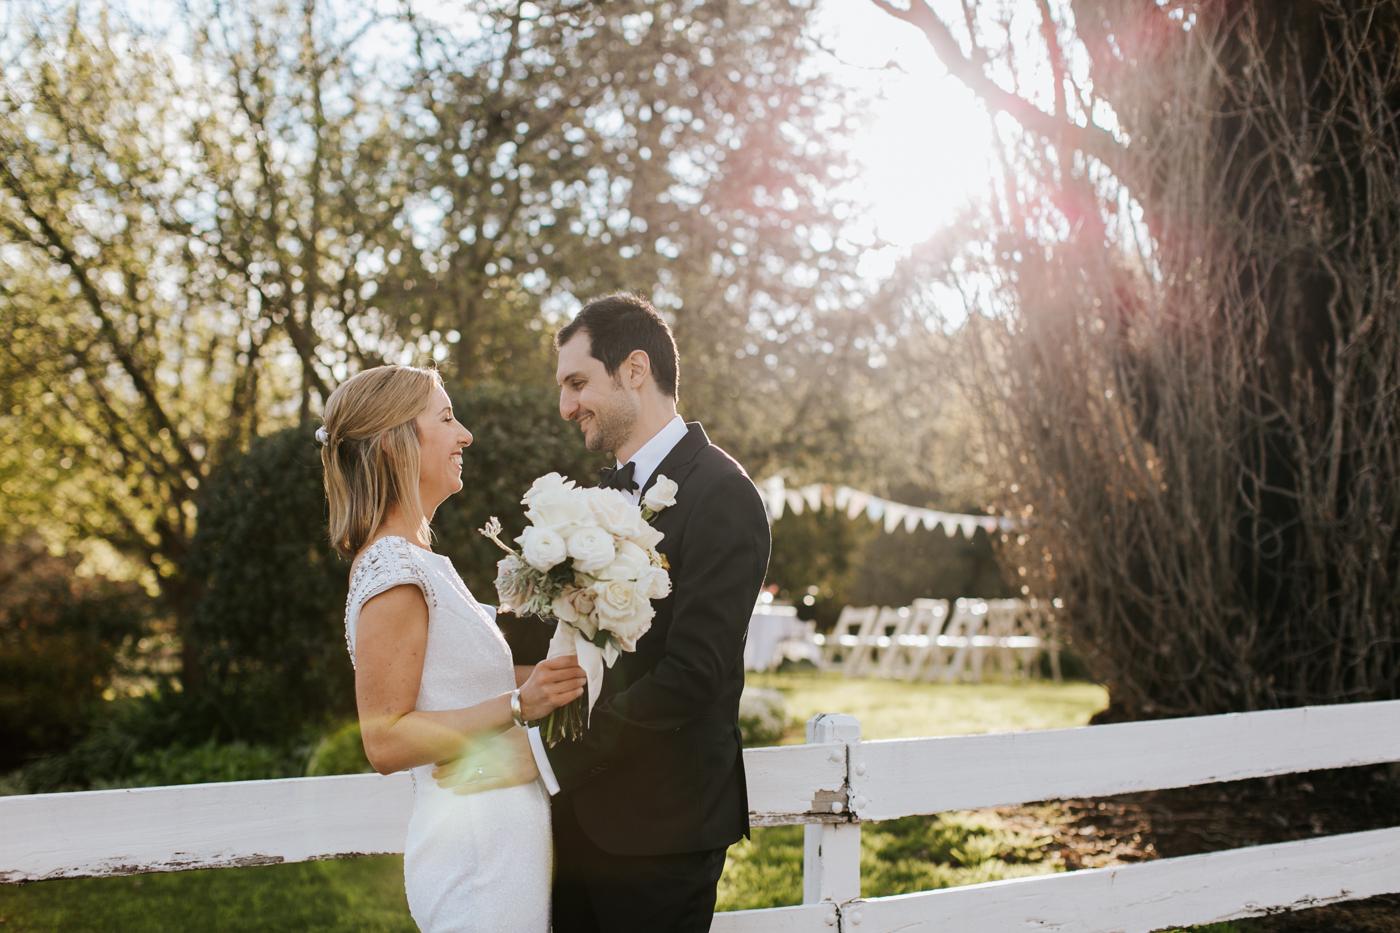 Bridget & James - Orange Country Wedding - Samantha Heather Photography-125.jpg